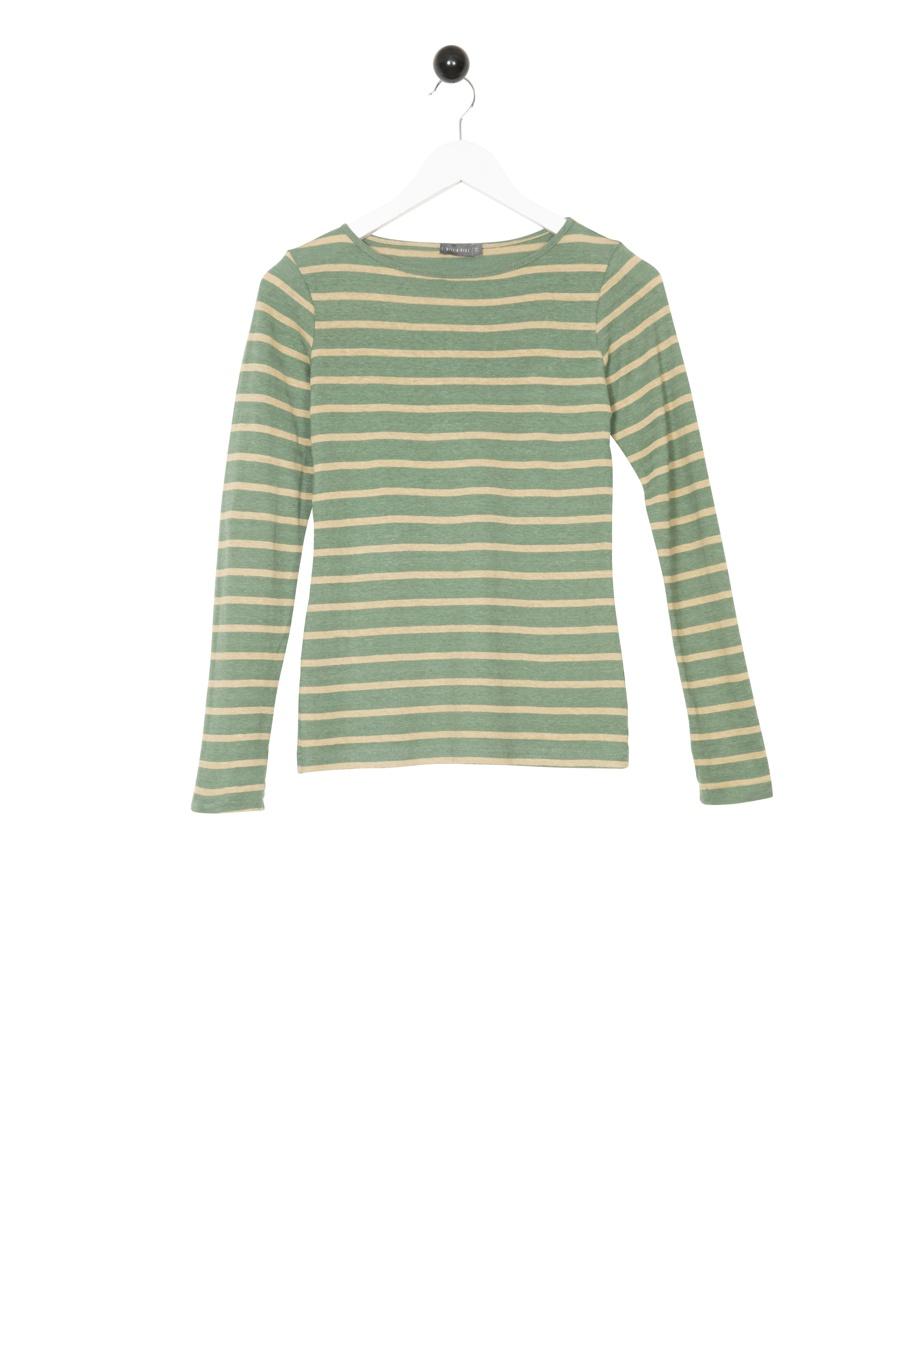 Return Öja Sweater